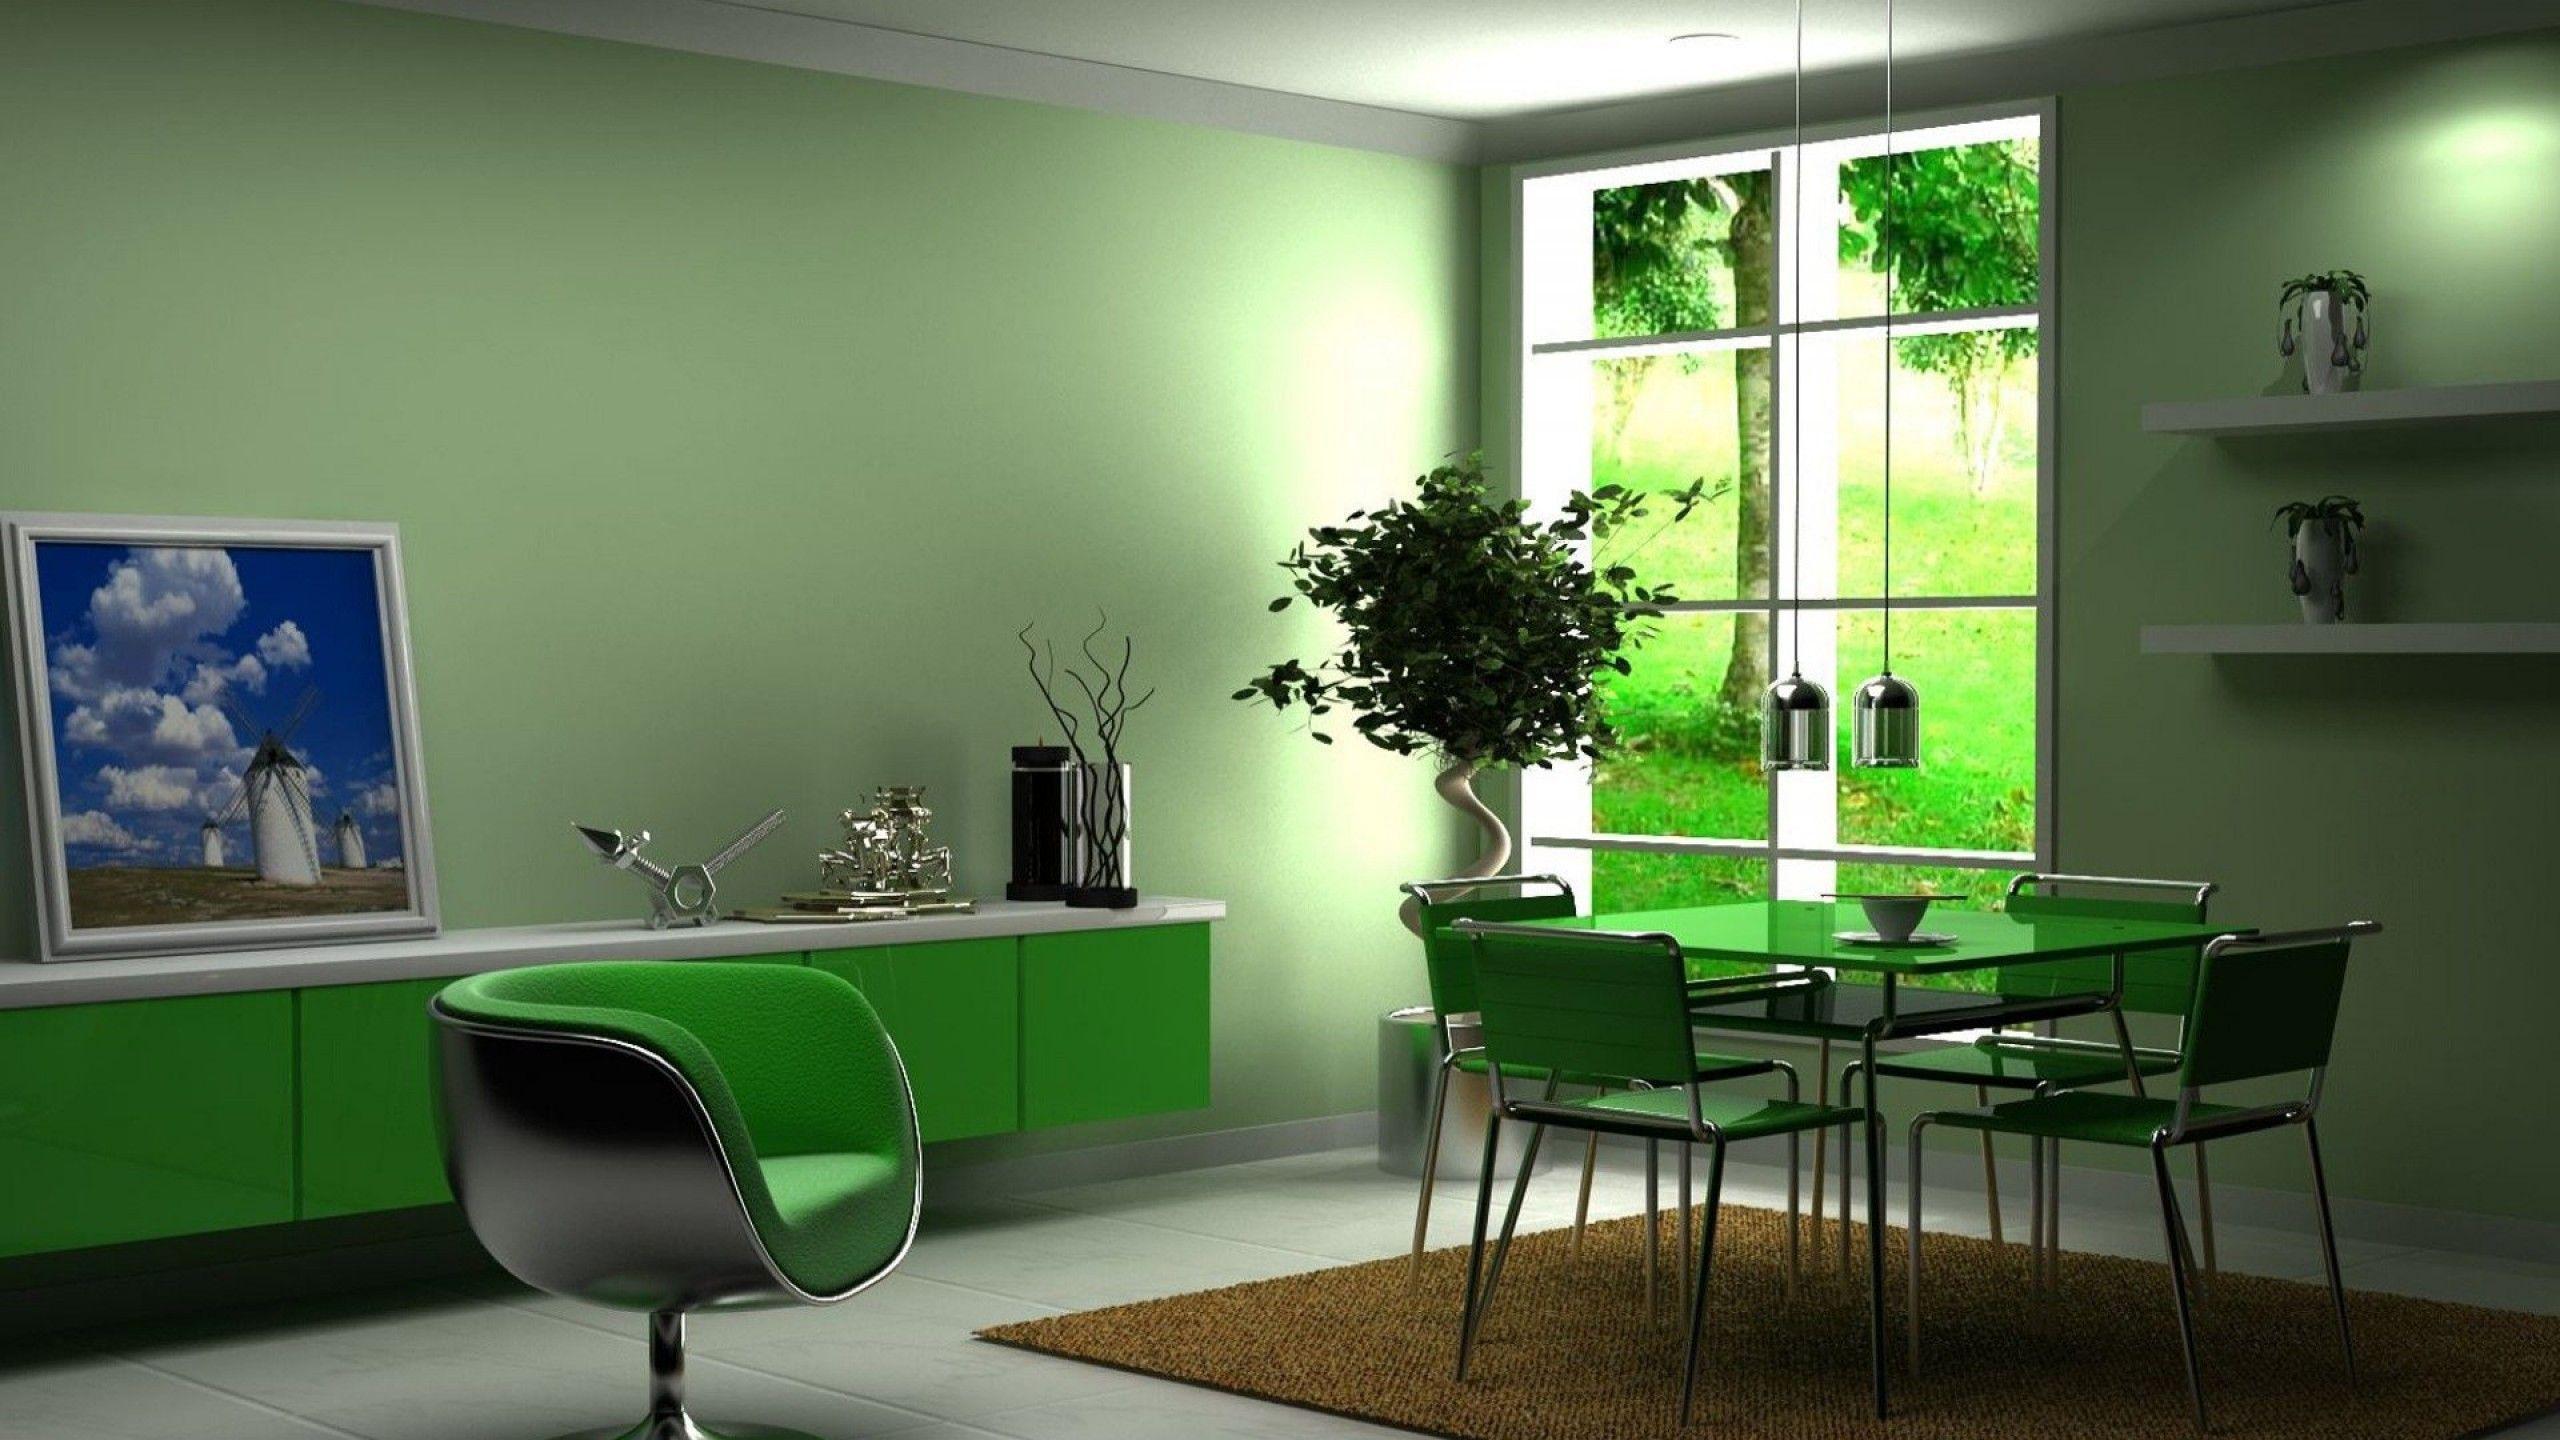 Interior Design Wallpapers Top Free Interior Design Backgrounds Wallpaperaccess